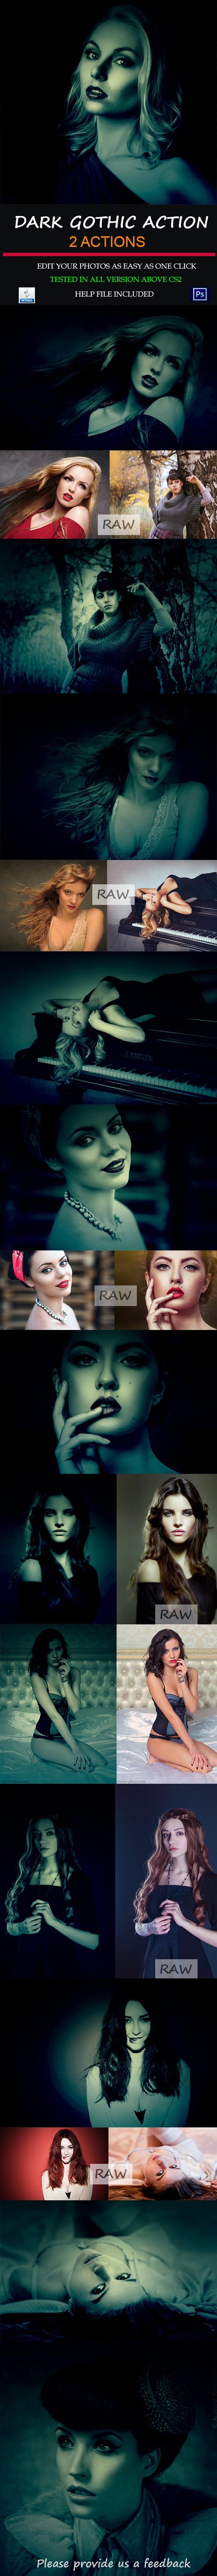 Dark Gothic Premium Actions - Photo Effects Actions